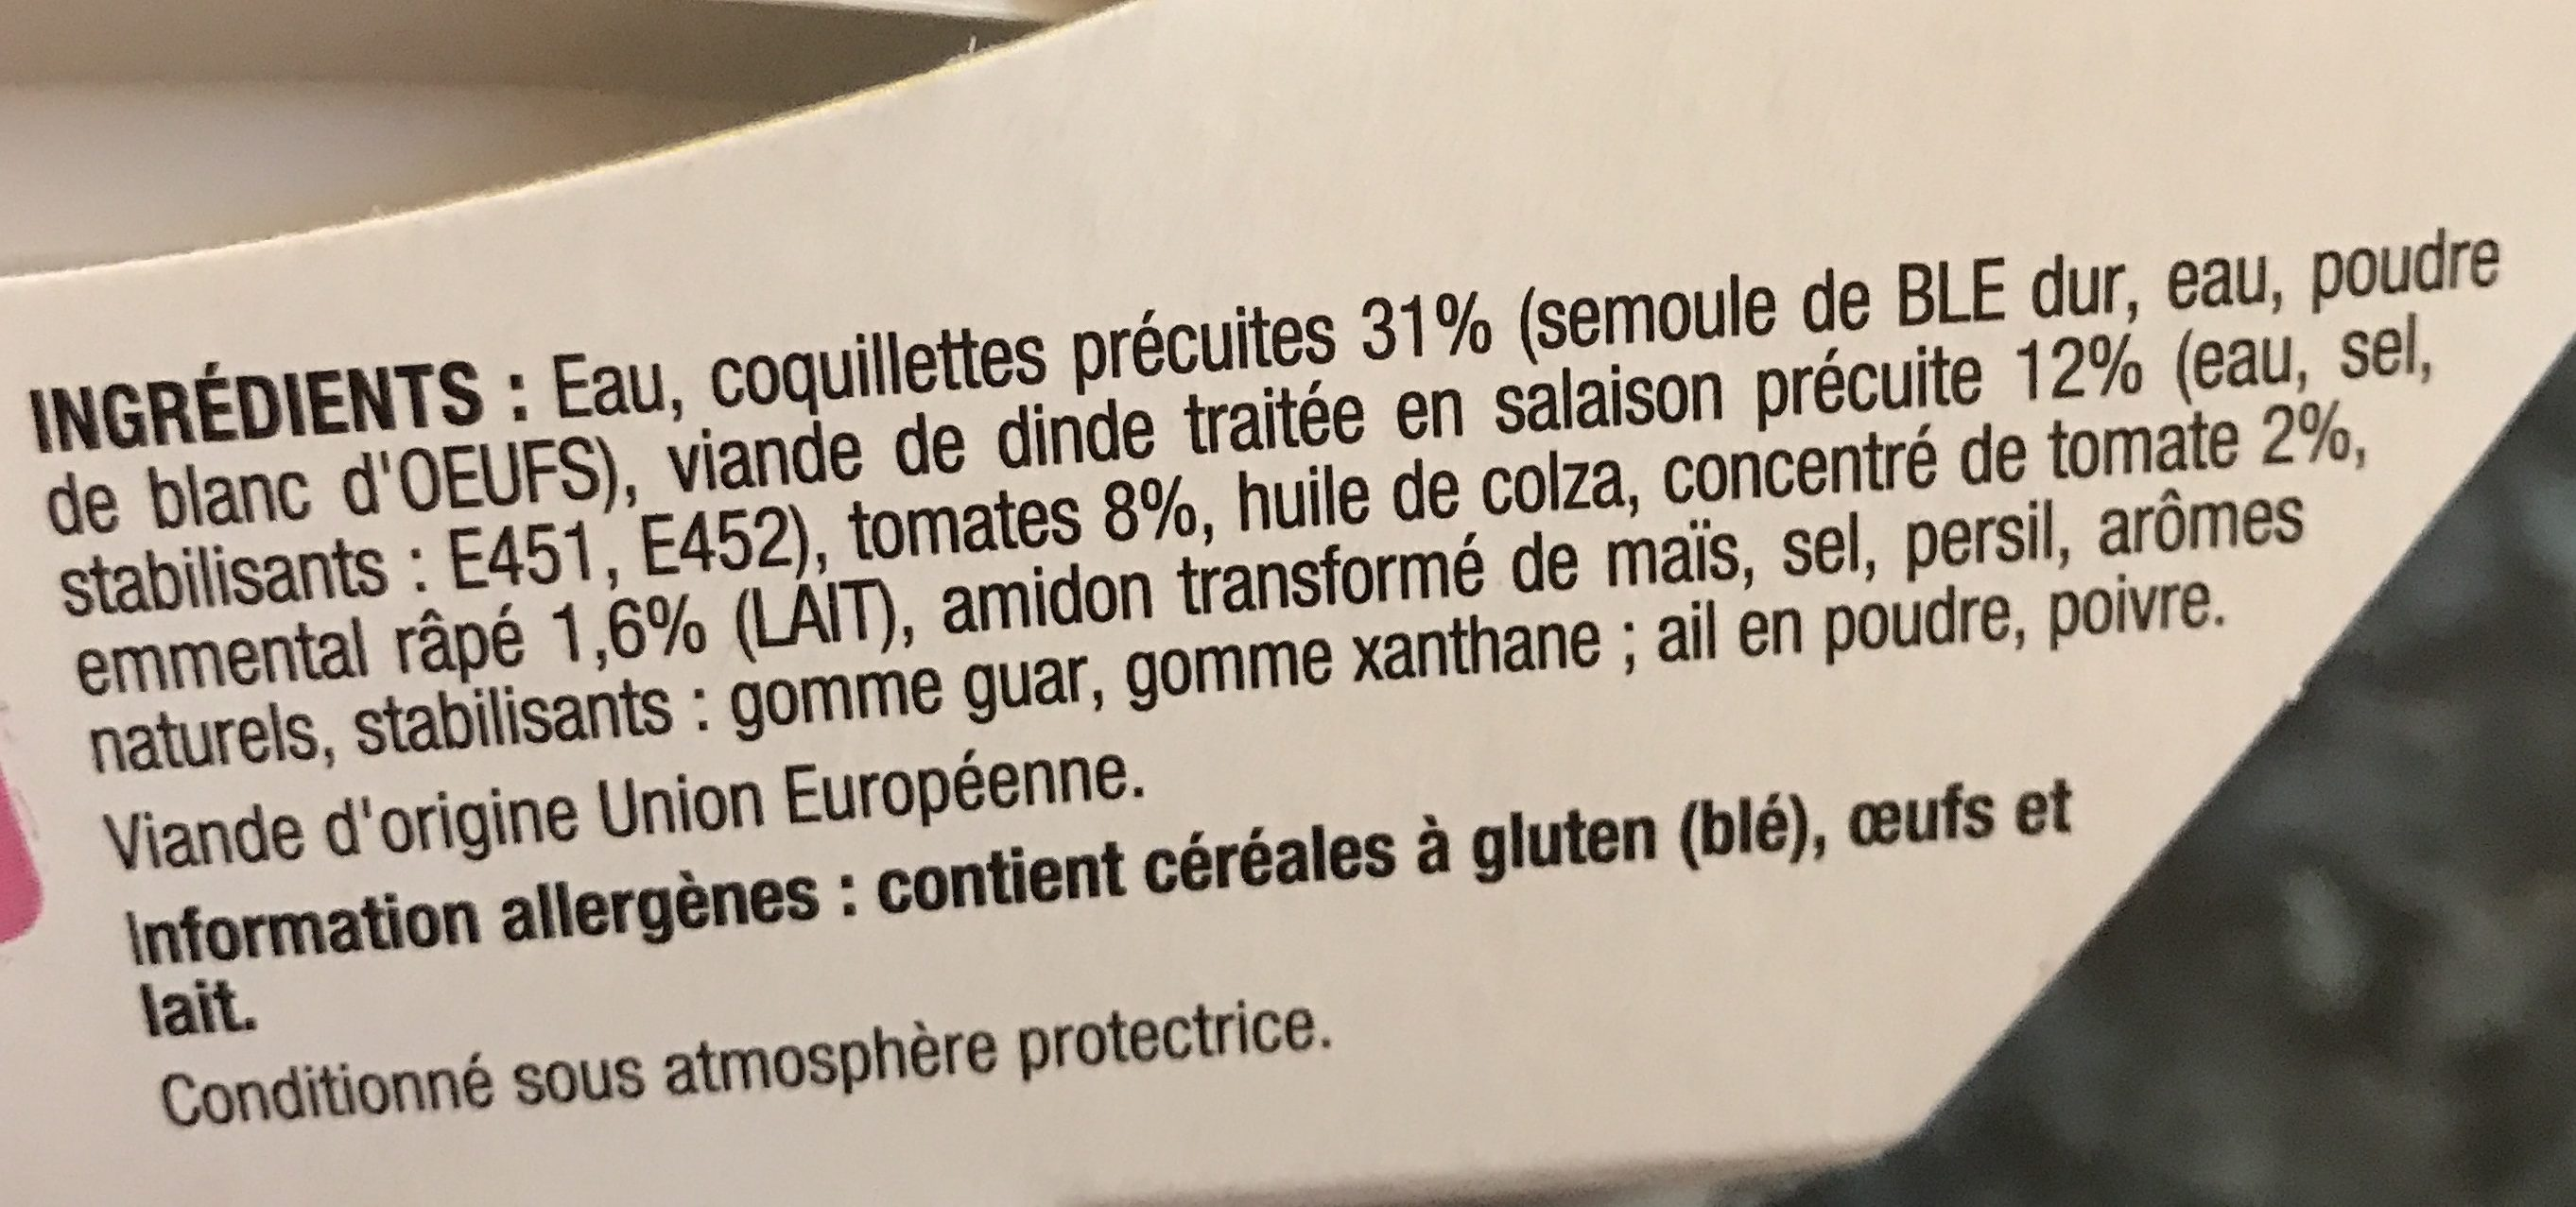 Coquillettes dinde emmental sauce tomate - Ingredients